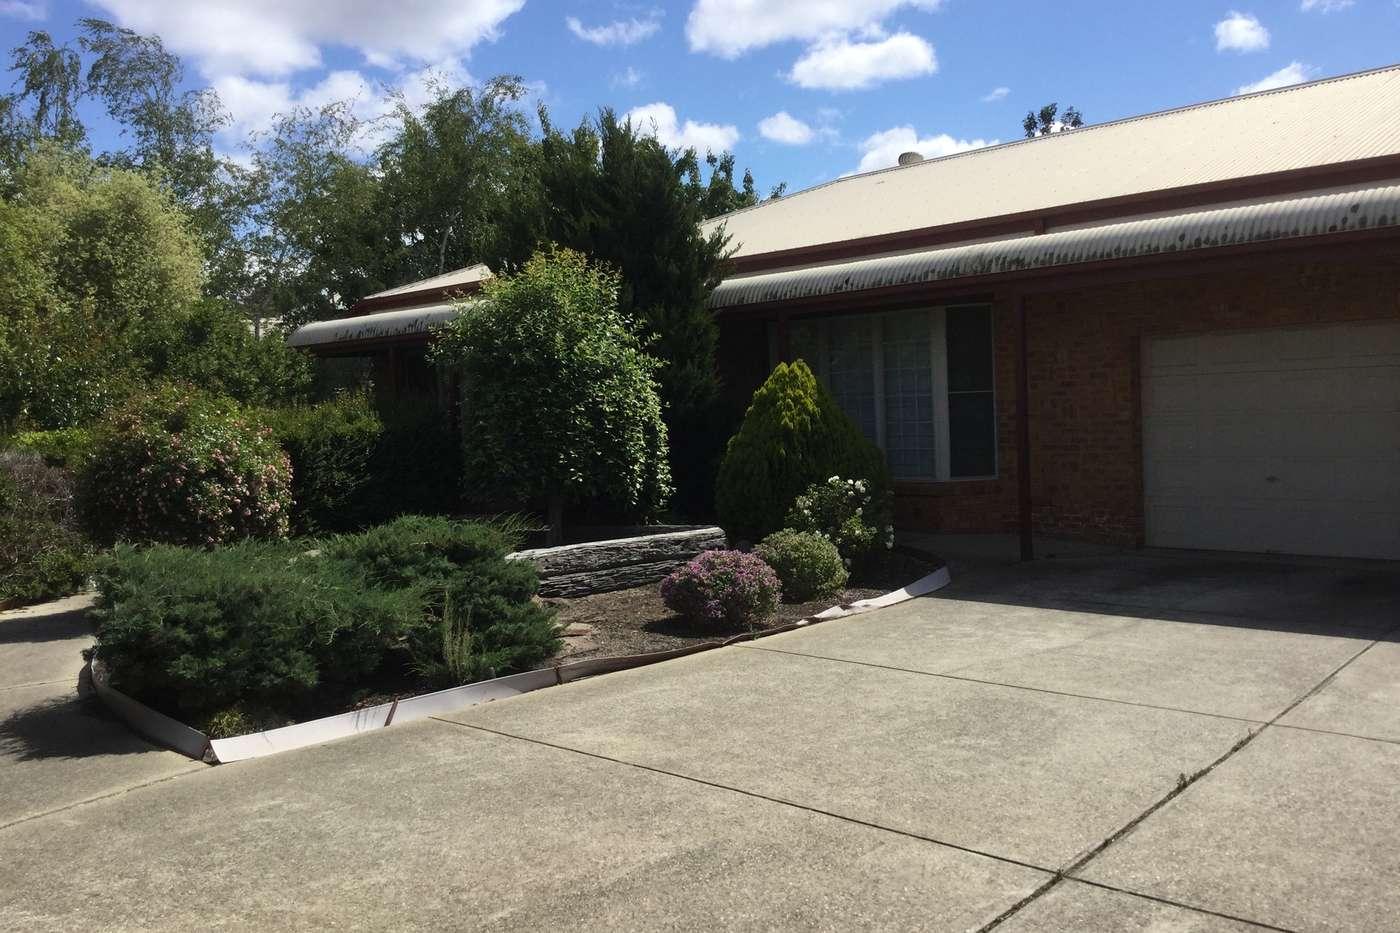 Main view of Homely house listing, 38 Mount Gisborne Road, Gisborne, VIC 3437